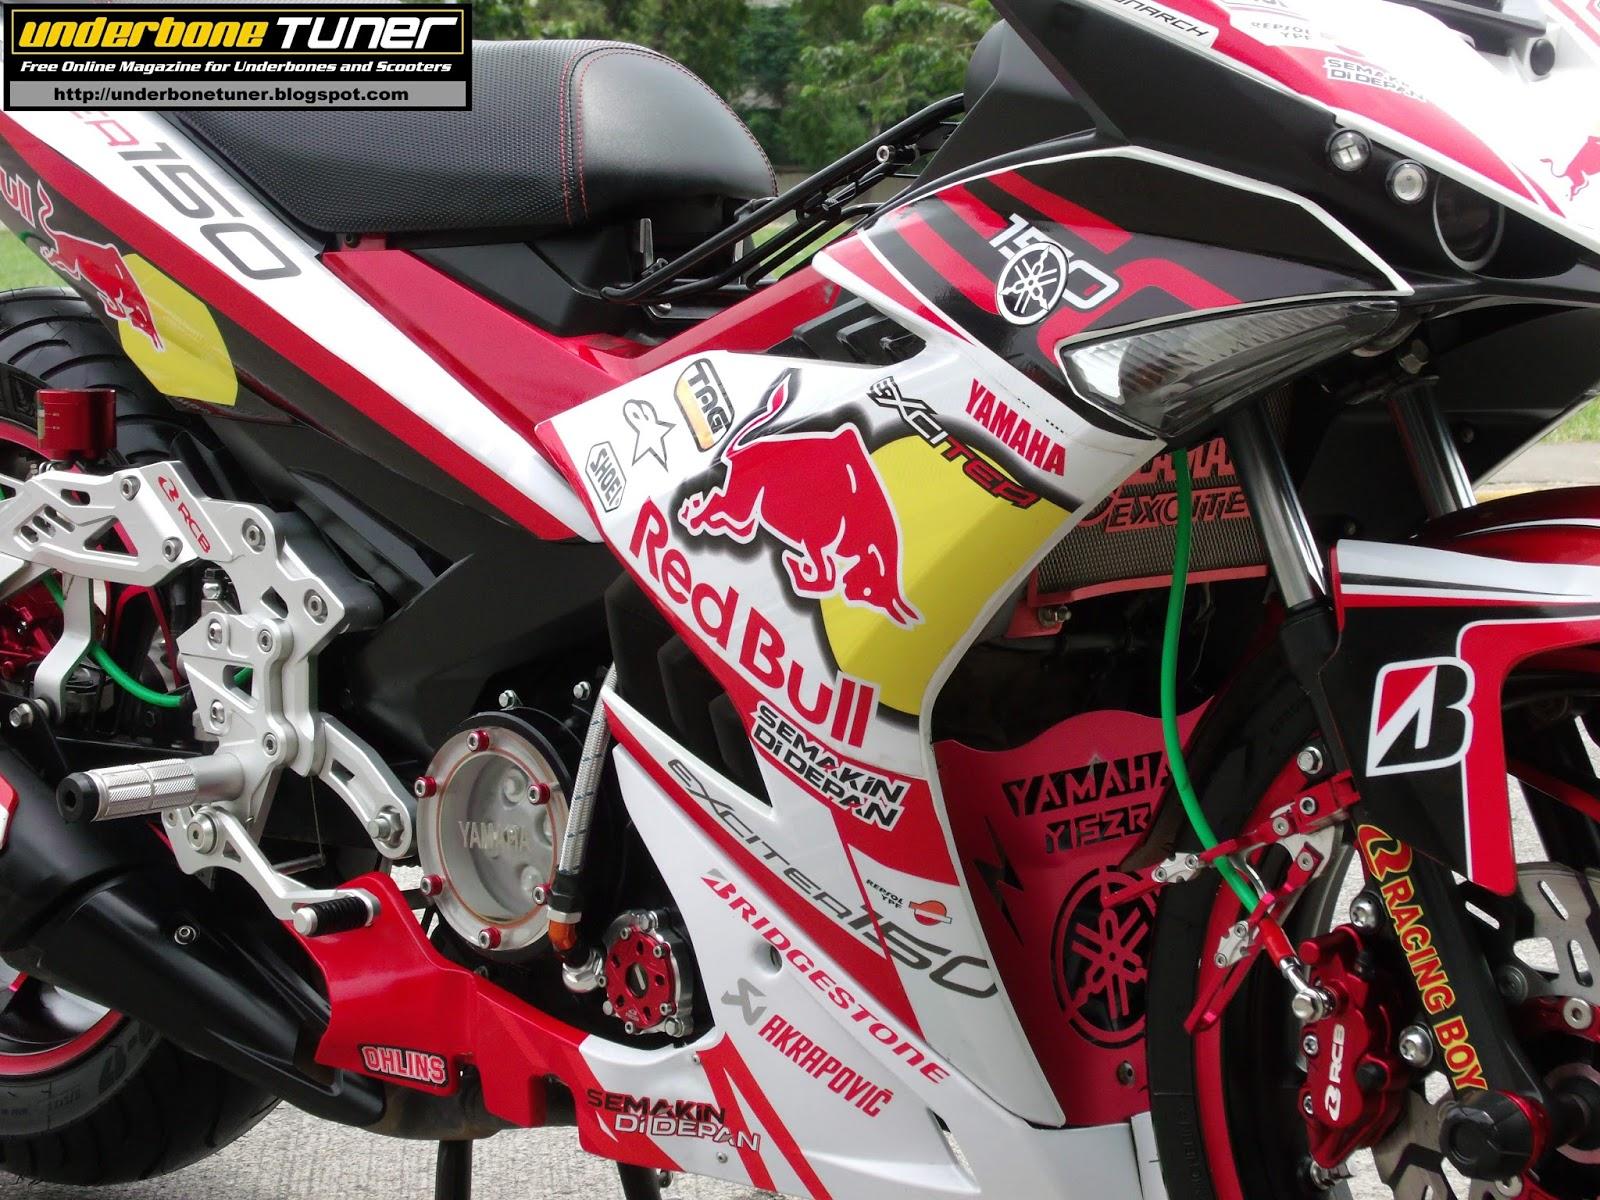 Sniper 150 Decals >> underbone tuner: Red Bull Moto GP Insipired Yamaha Sniper 150 MXi from Bantigue Bantayan Island Cebu